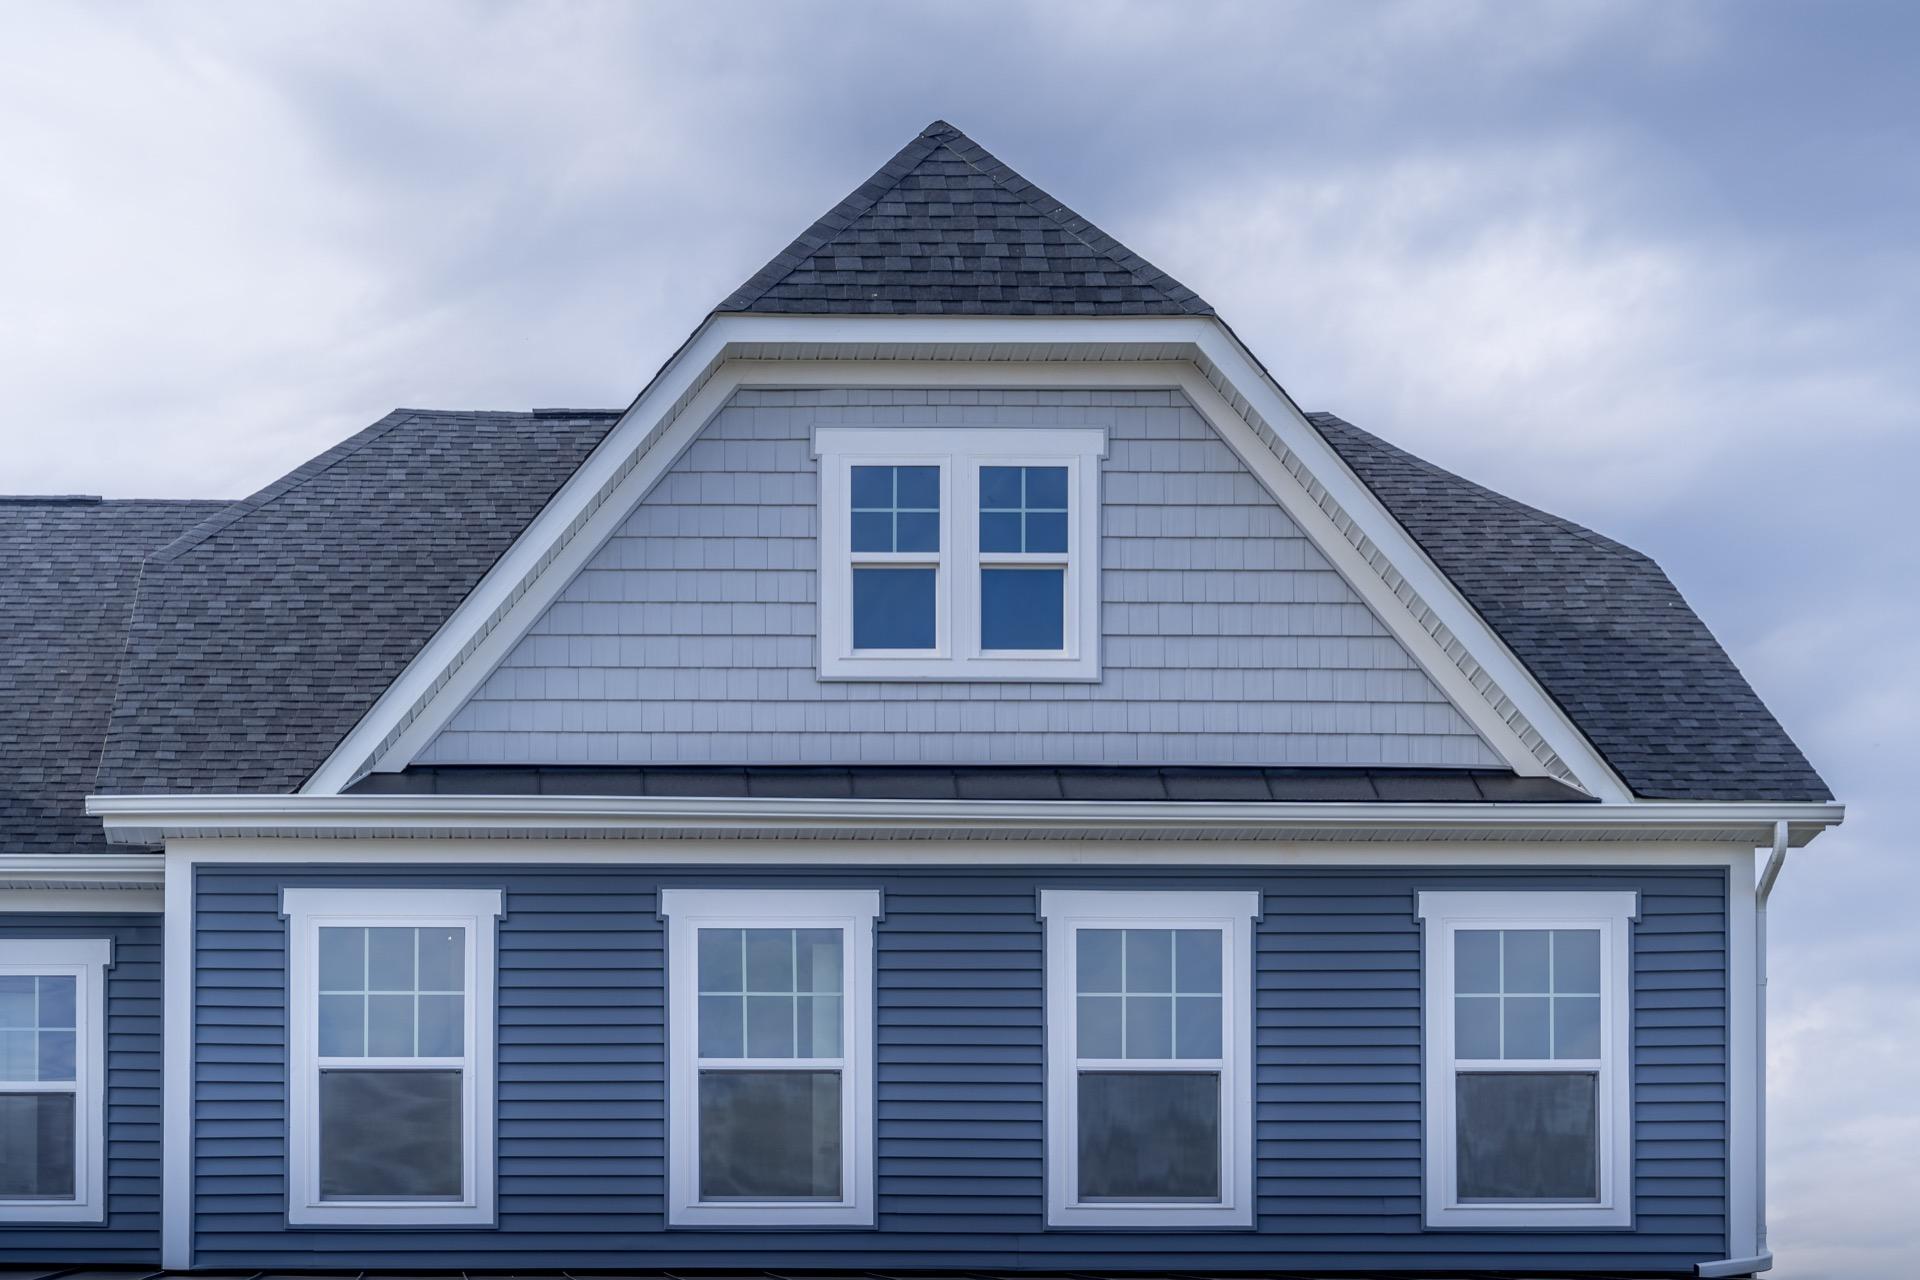 Single hung windows on modern home